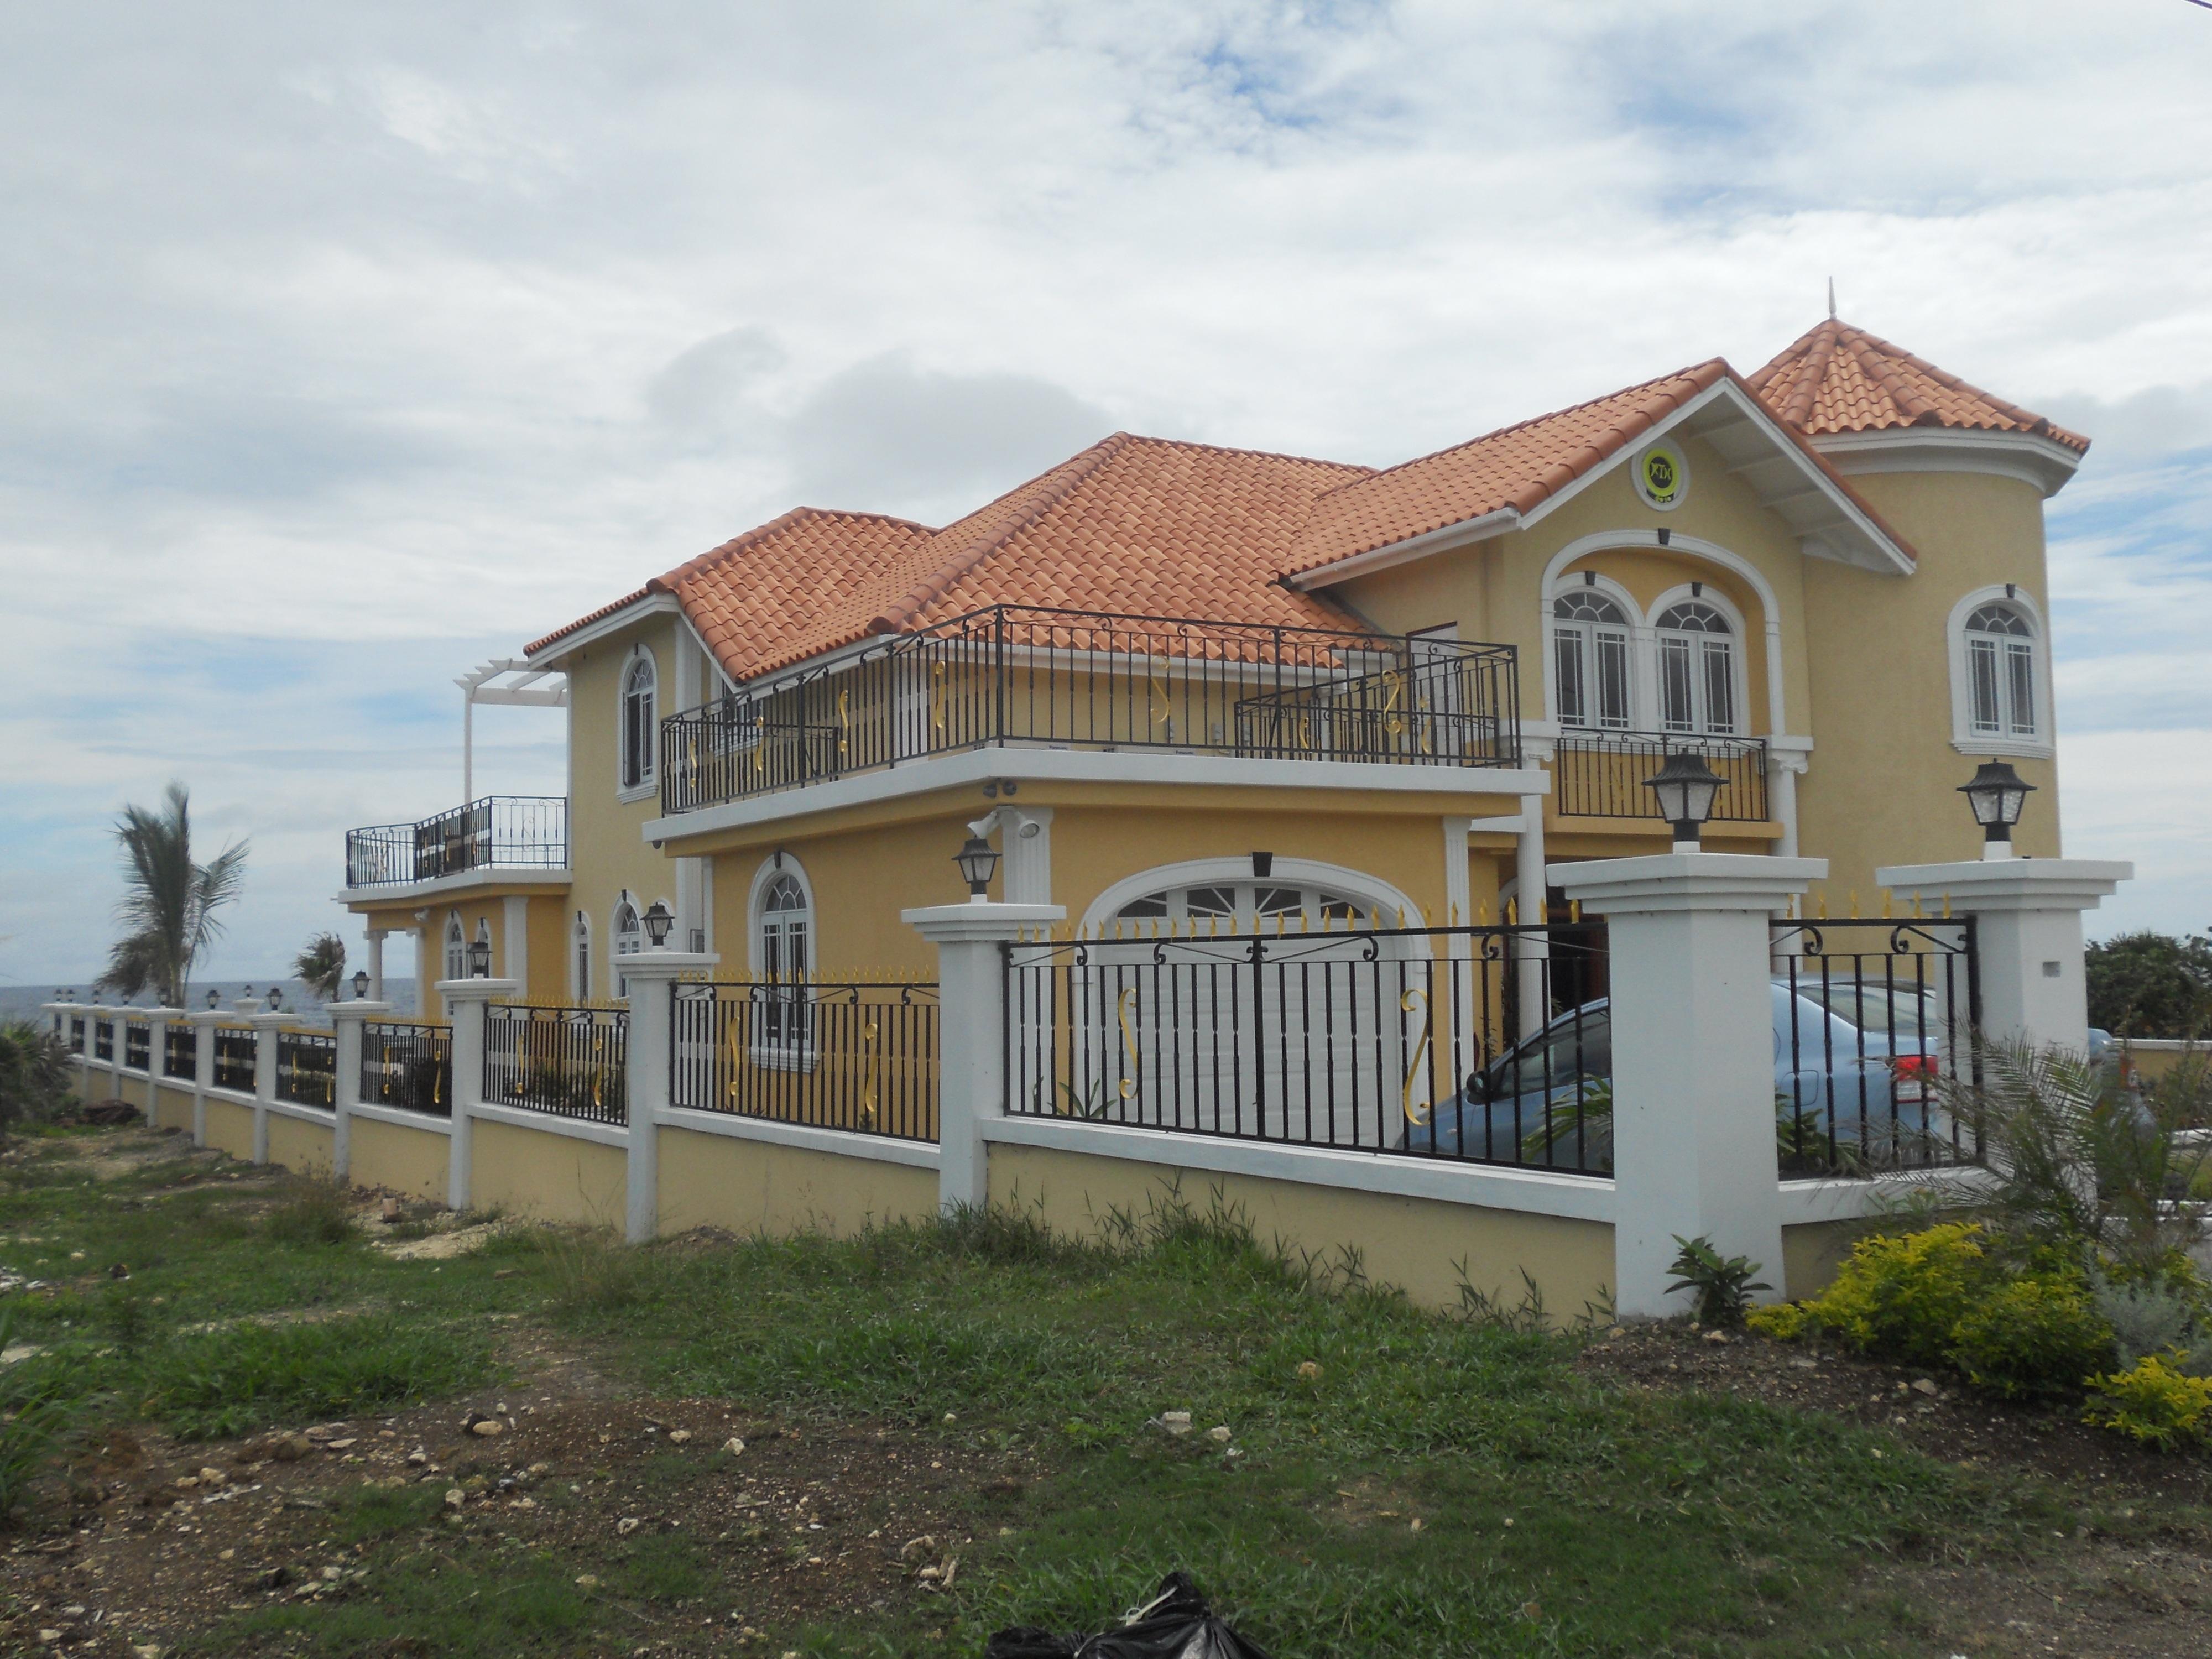 Architecture villa mansion house roof building home live suburb cottage facade property modern farmhouse jamaica estate